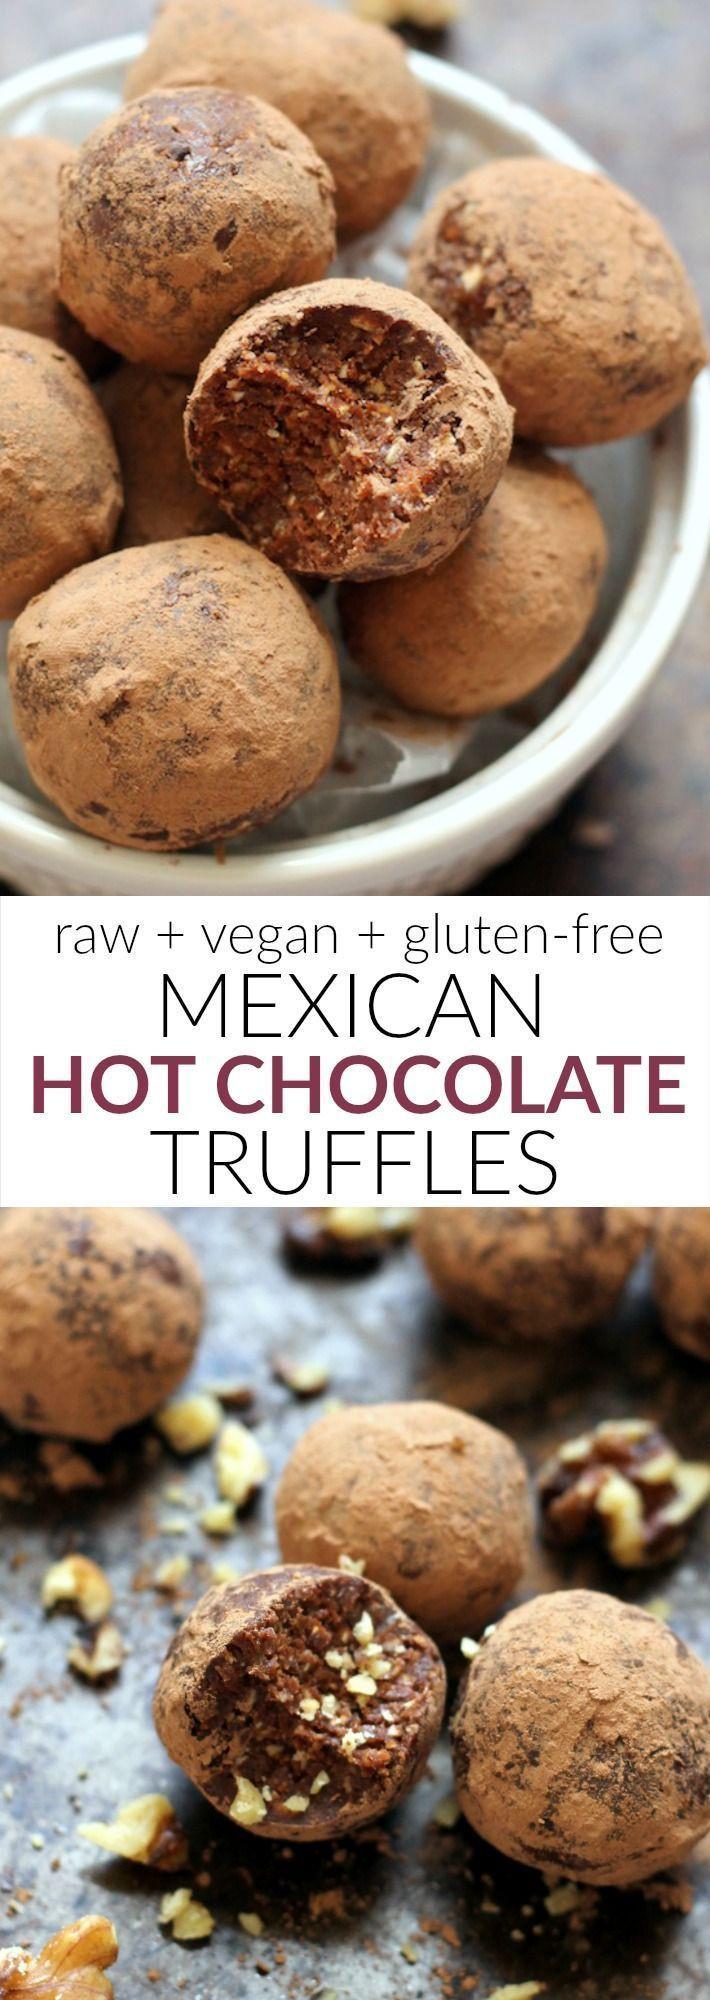 Healthy Mexican Desserts  Best 25 Healthy mexican dessert ideas on Pinterest